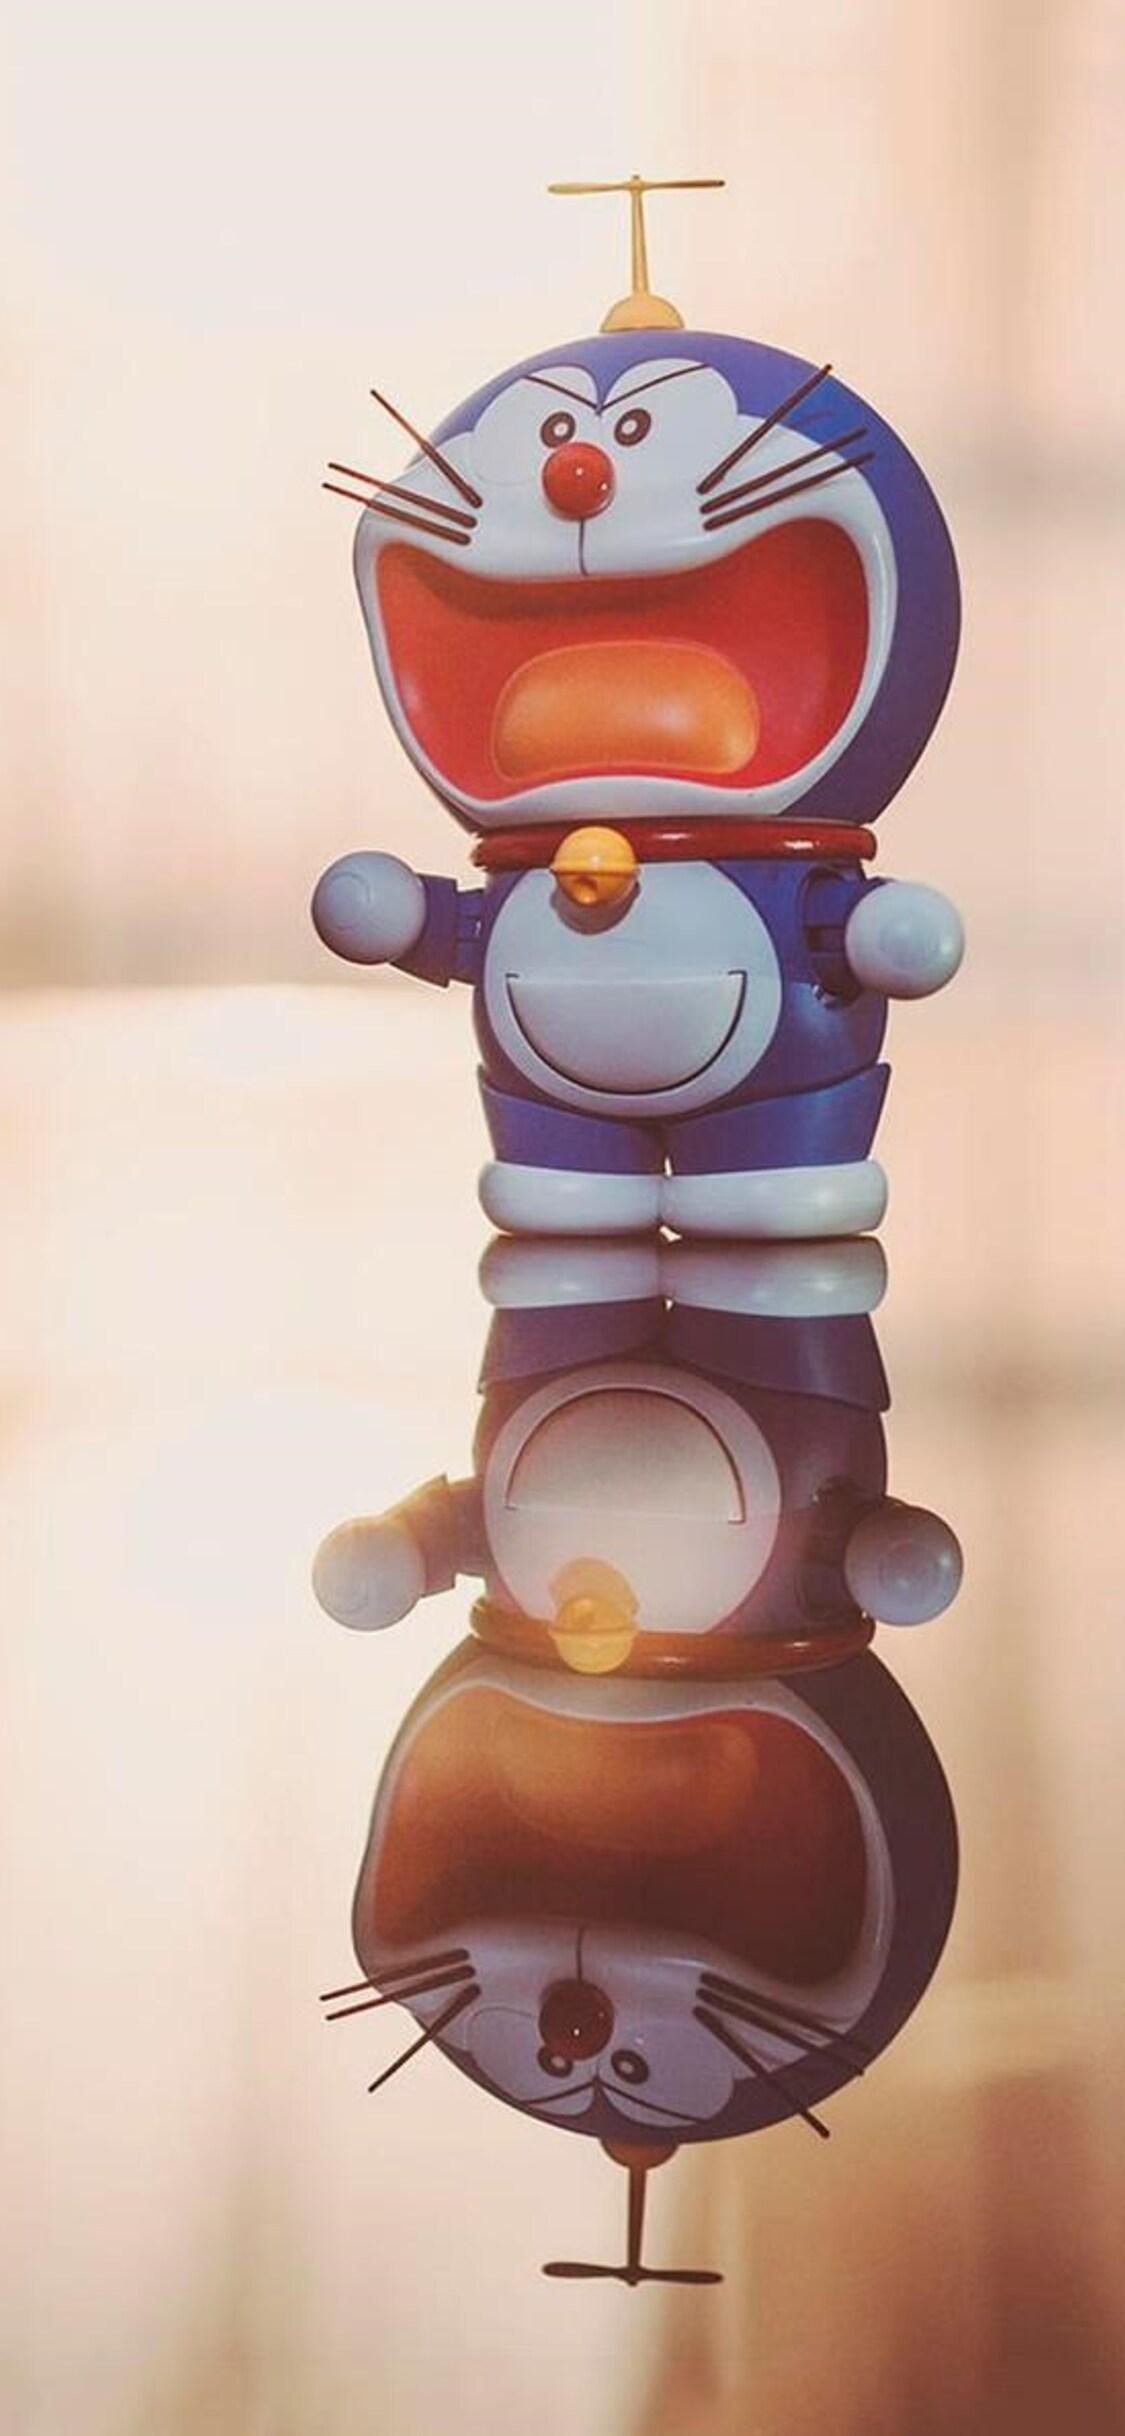 1125x2436 Doraemon Toy Iphone Xs Iphone 10 Iphone X Hd 4k Wallpapers